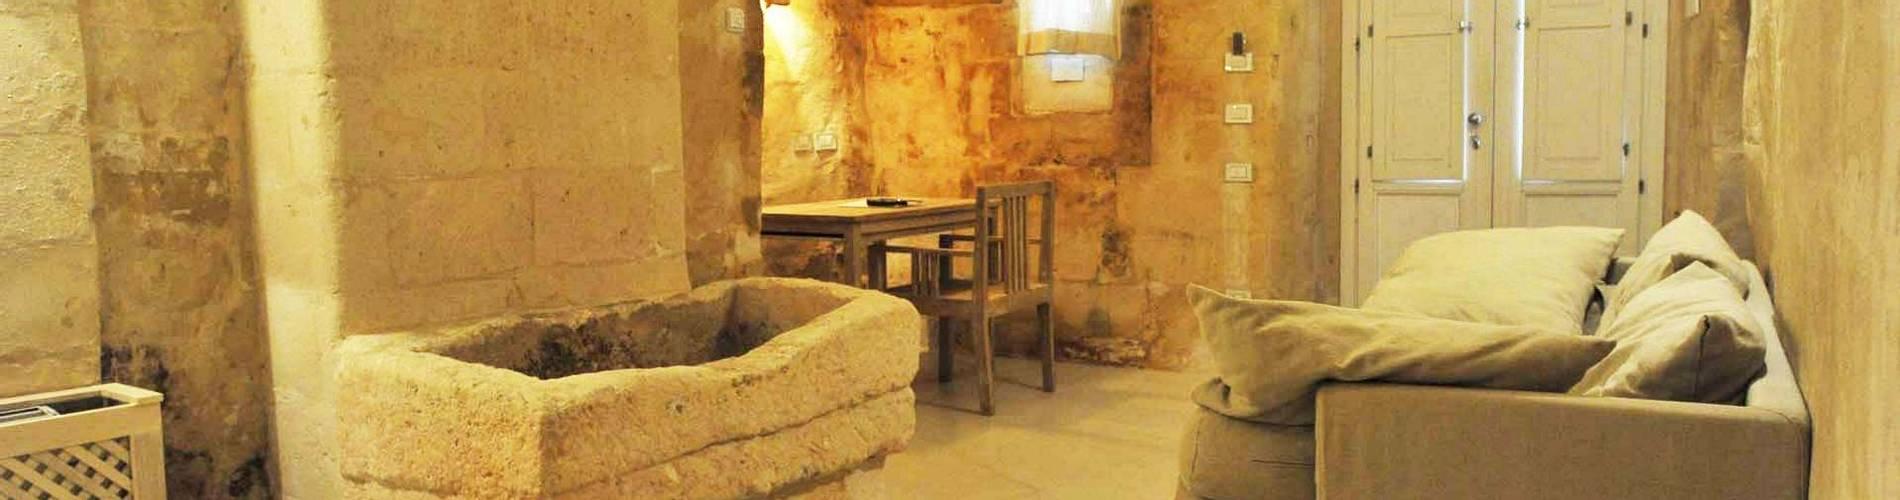 L'Hotel In Pietra, Basilicata, Italy, Deluxe Room 1005 (8).jpg